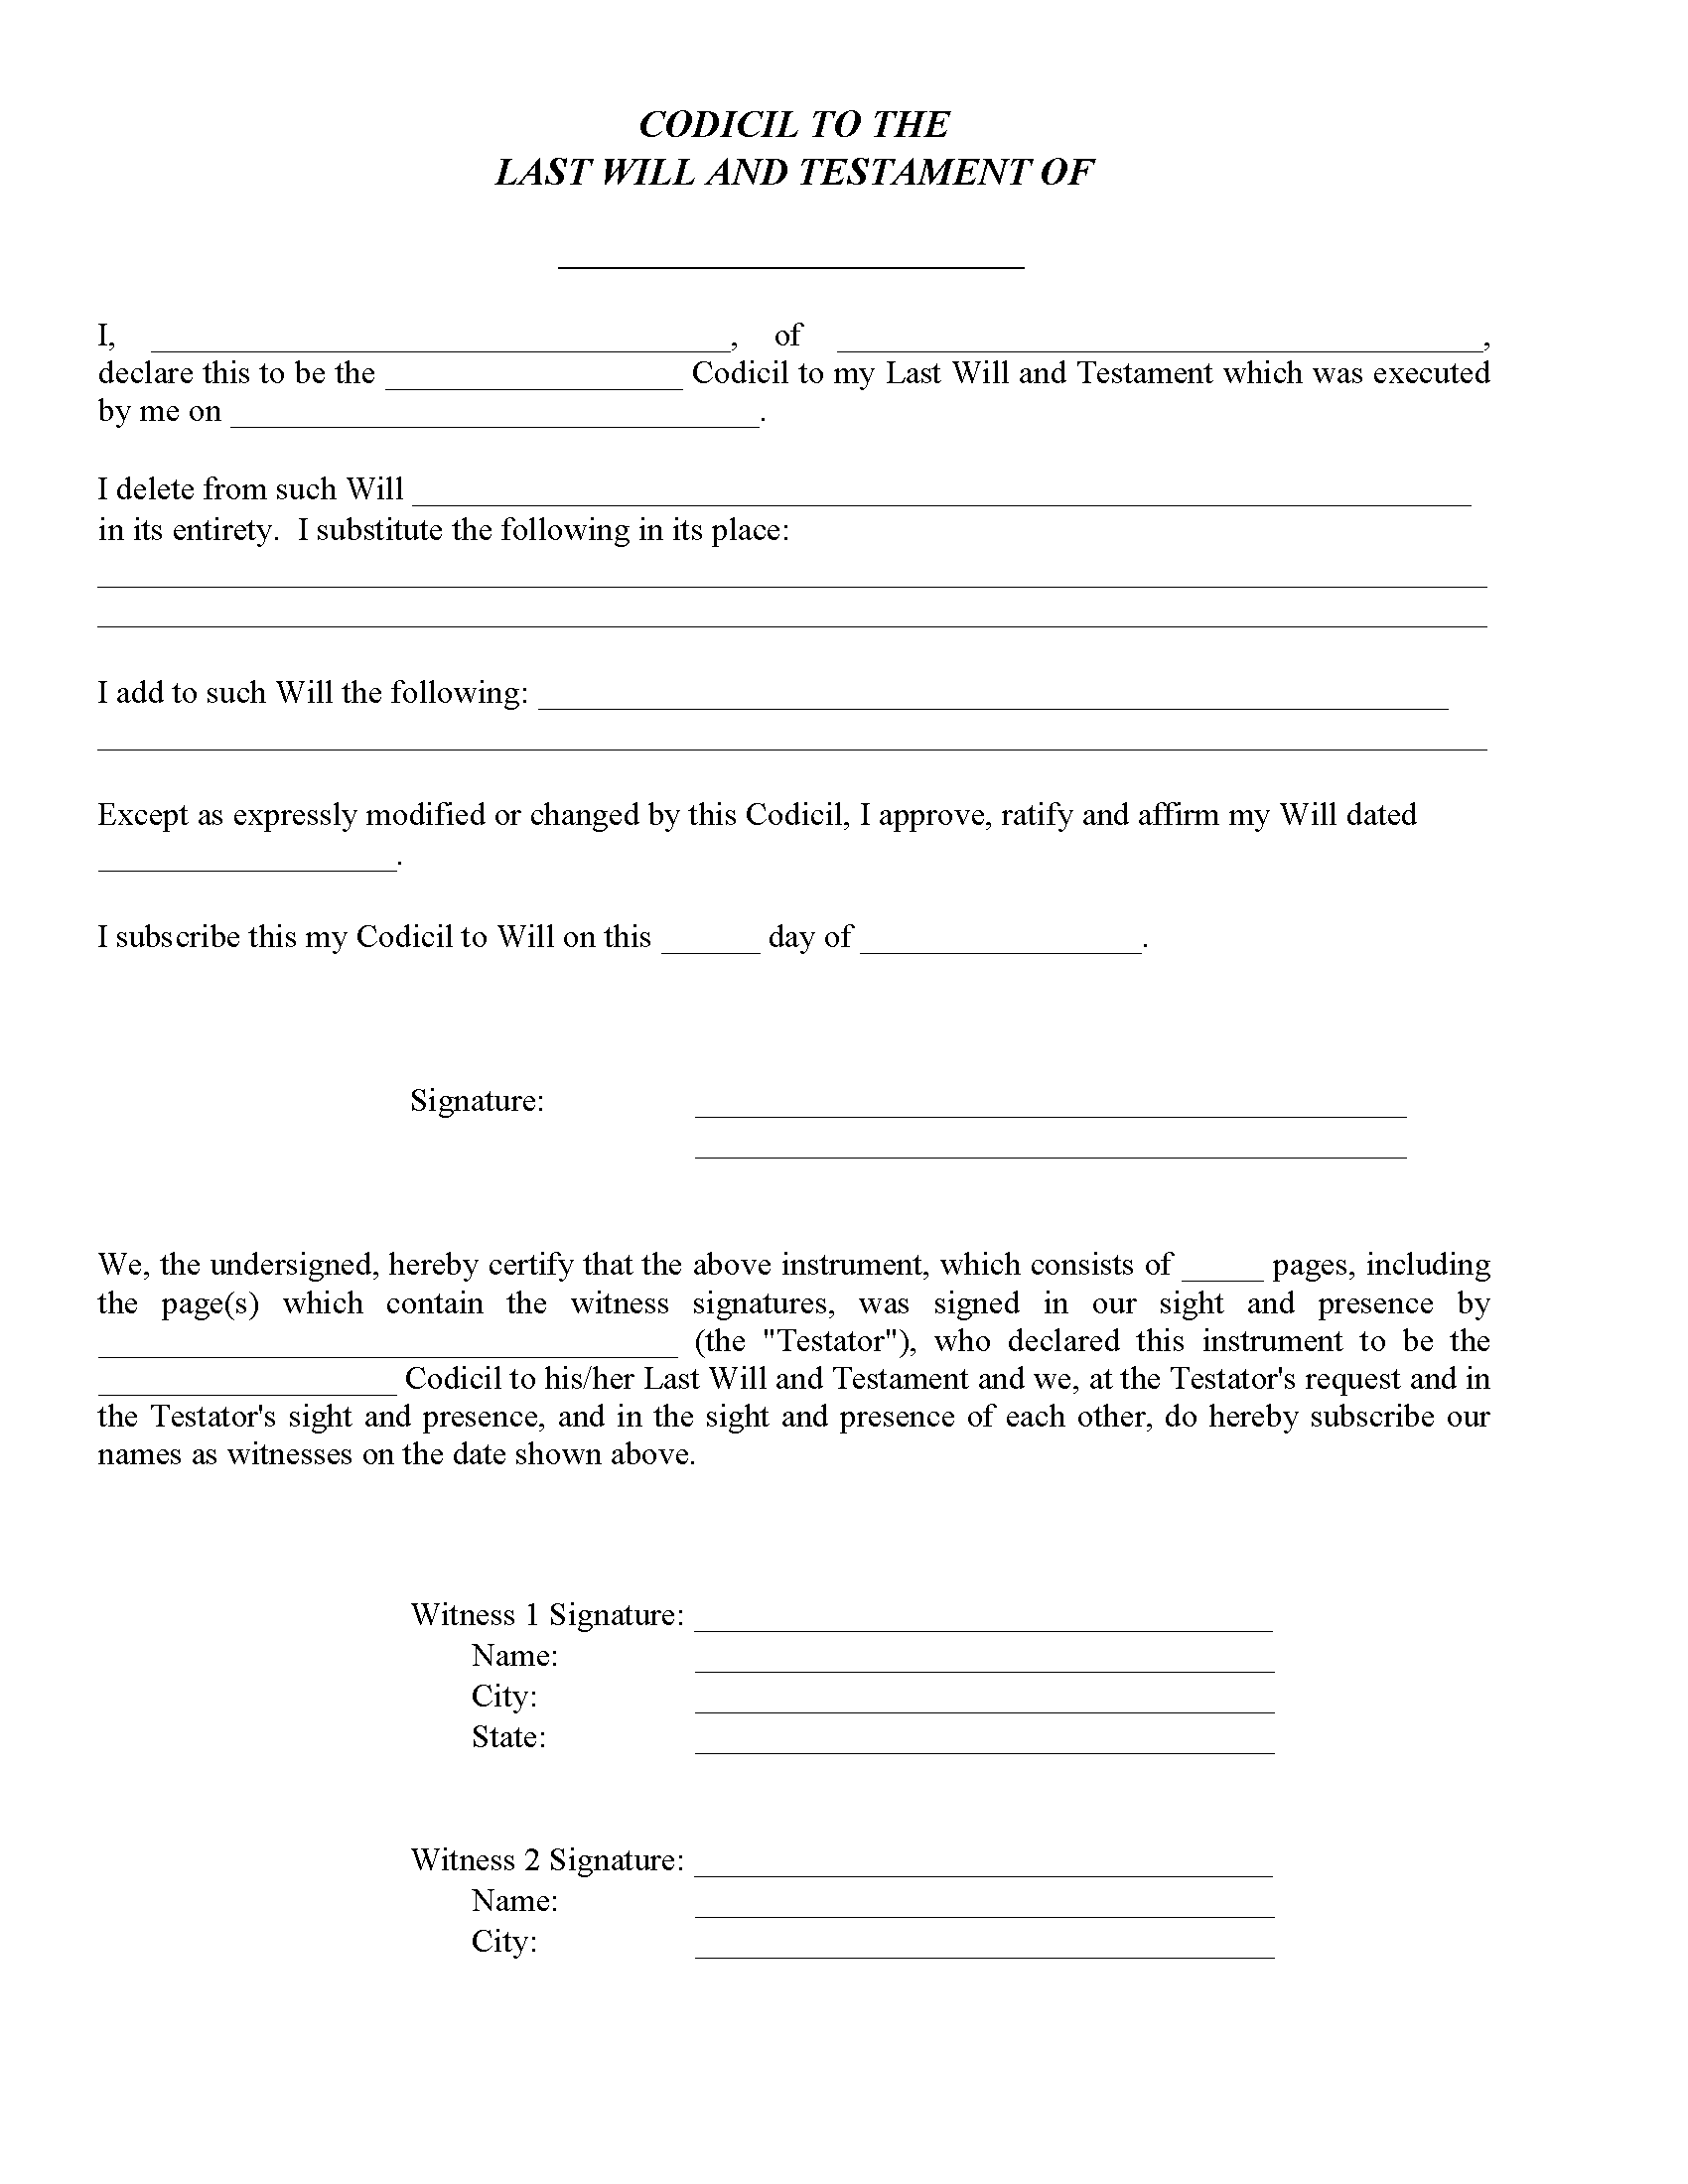 Kentucky Codicil To Will Form